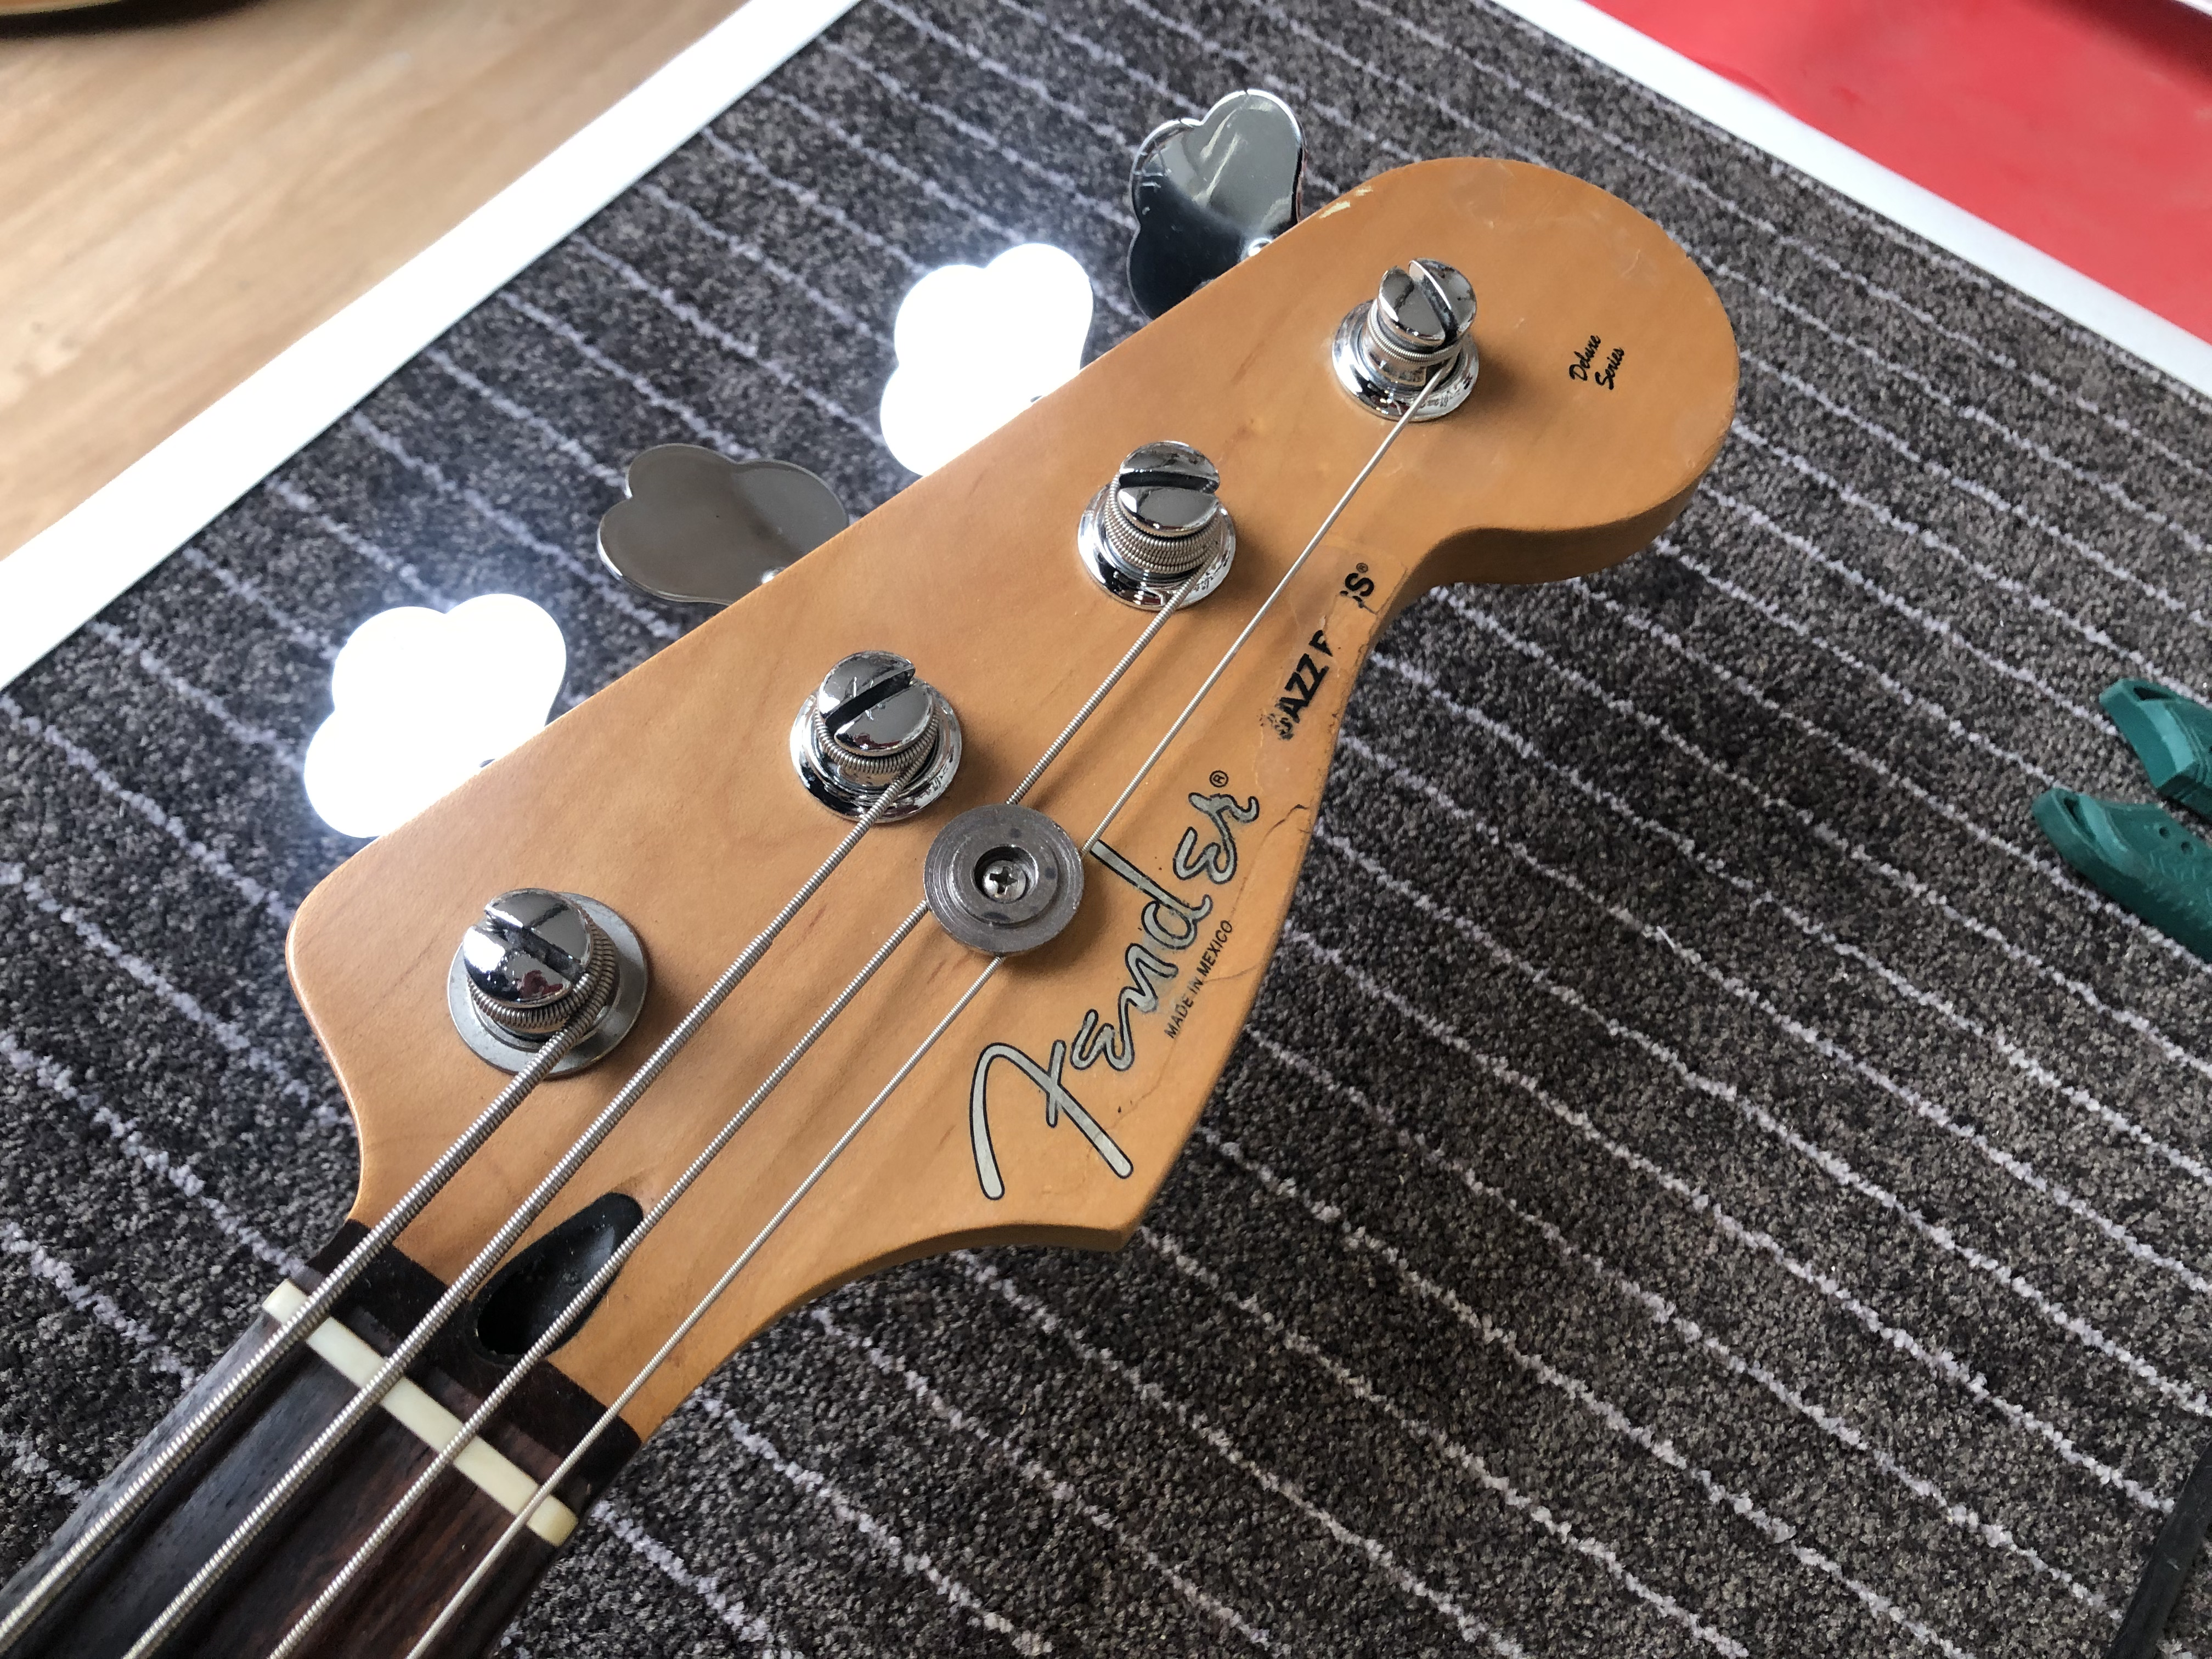 Setup on Fender Jazz Bass